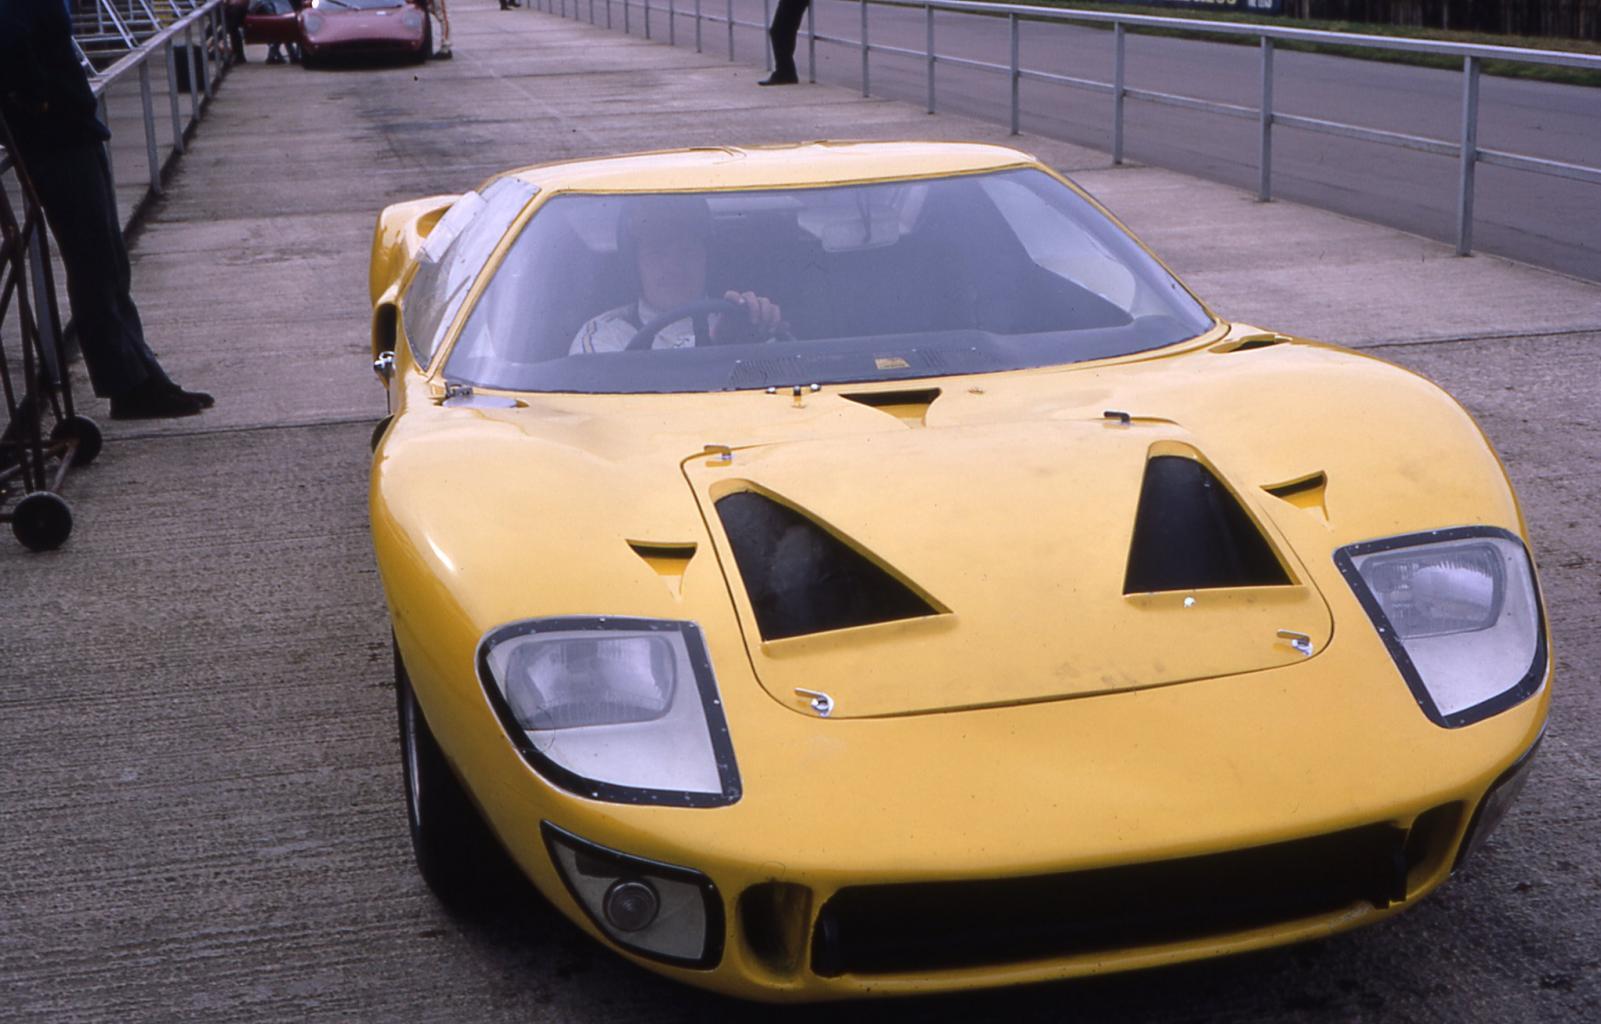 P1001-036-12th-malaya-garage-daghorn-p1001-oulton-park-69-jpg